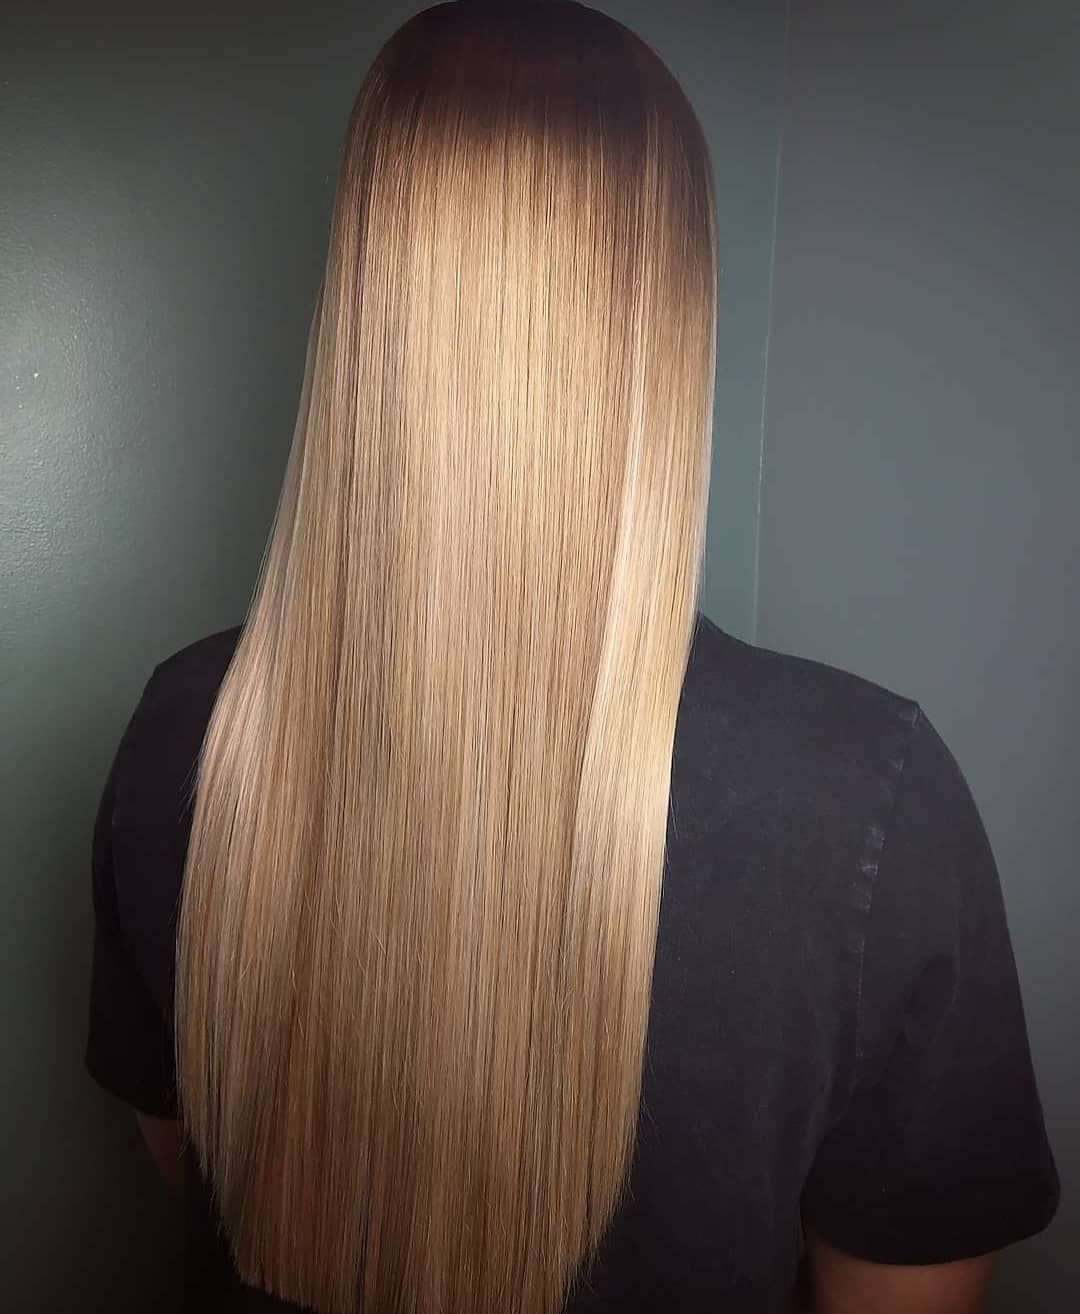 Long Glass Hair Hair Color Trends Long Hair Styles Hair